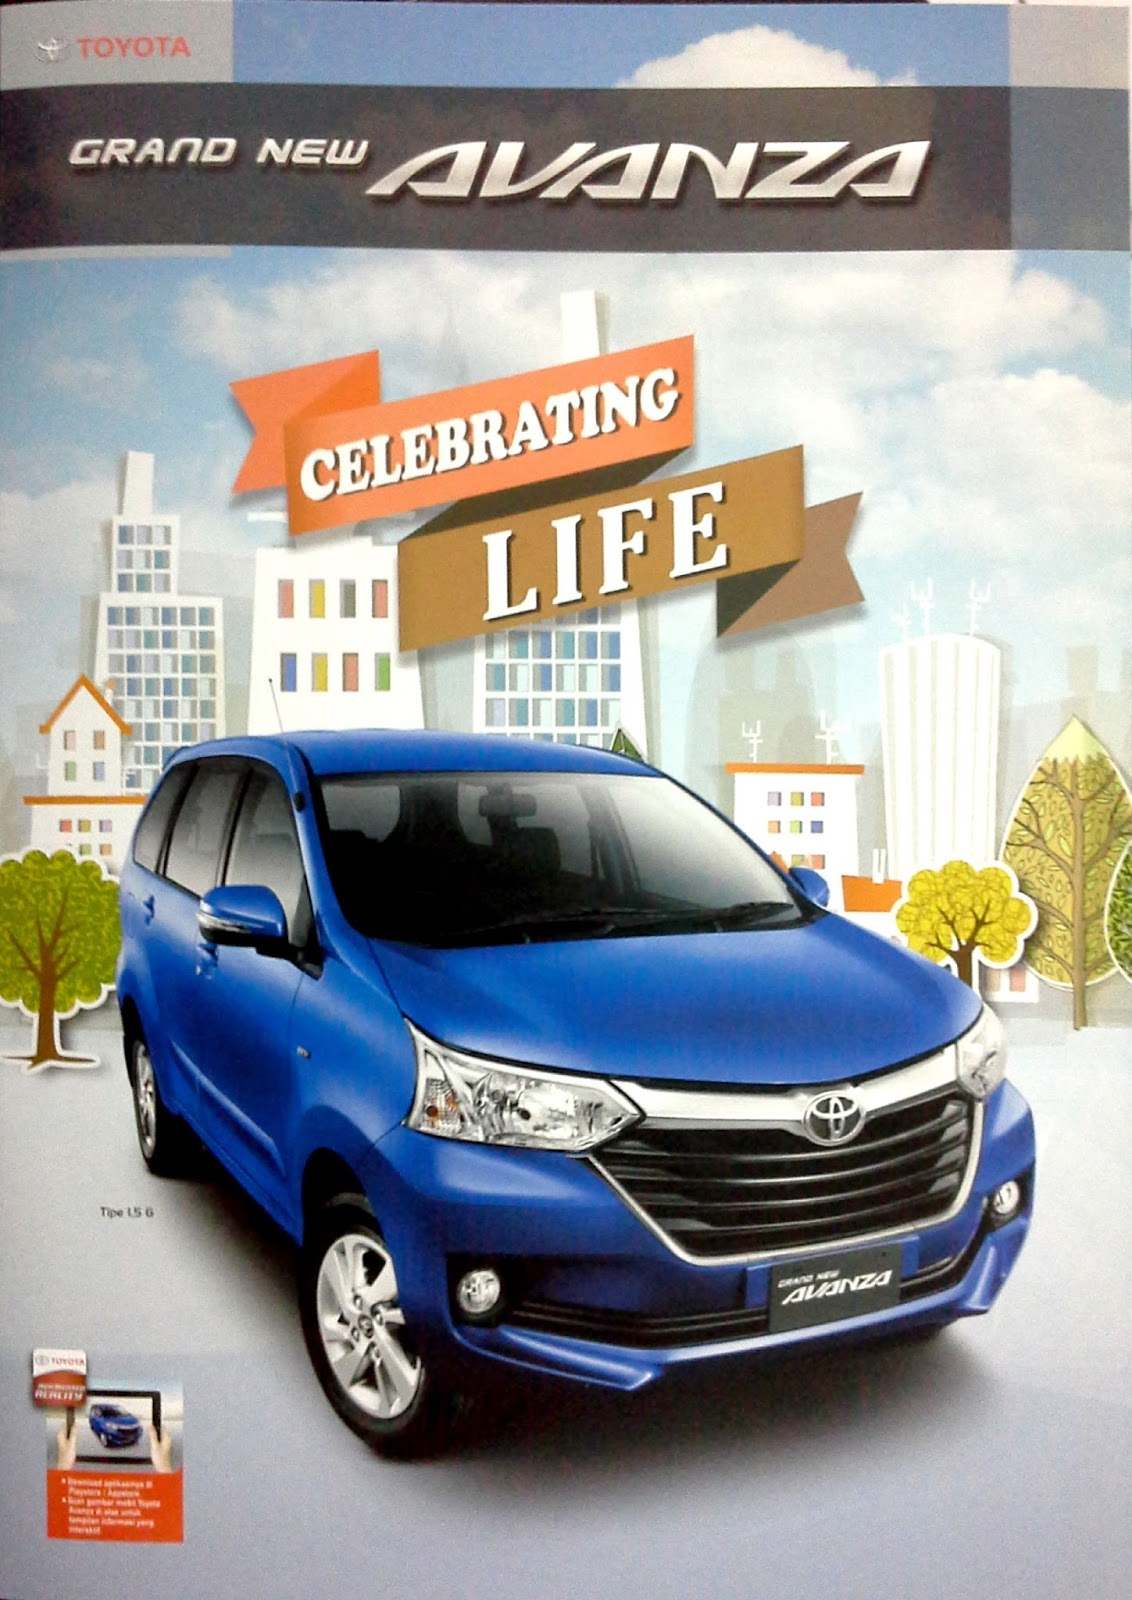 Grand New Avanza Veloz 1.3 Harga Otr Medan Jual Beli Toyota Jakarta